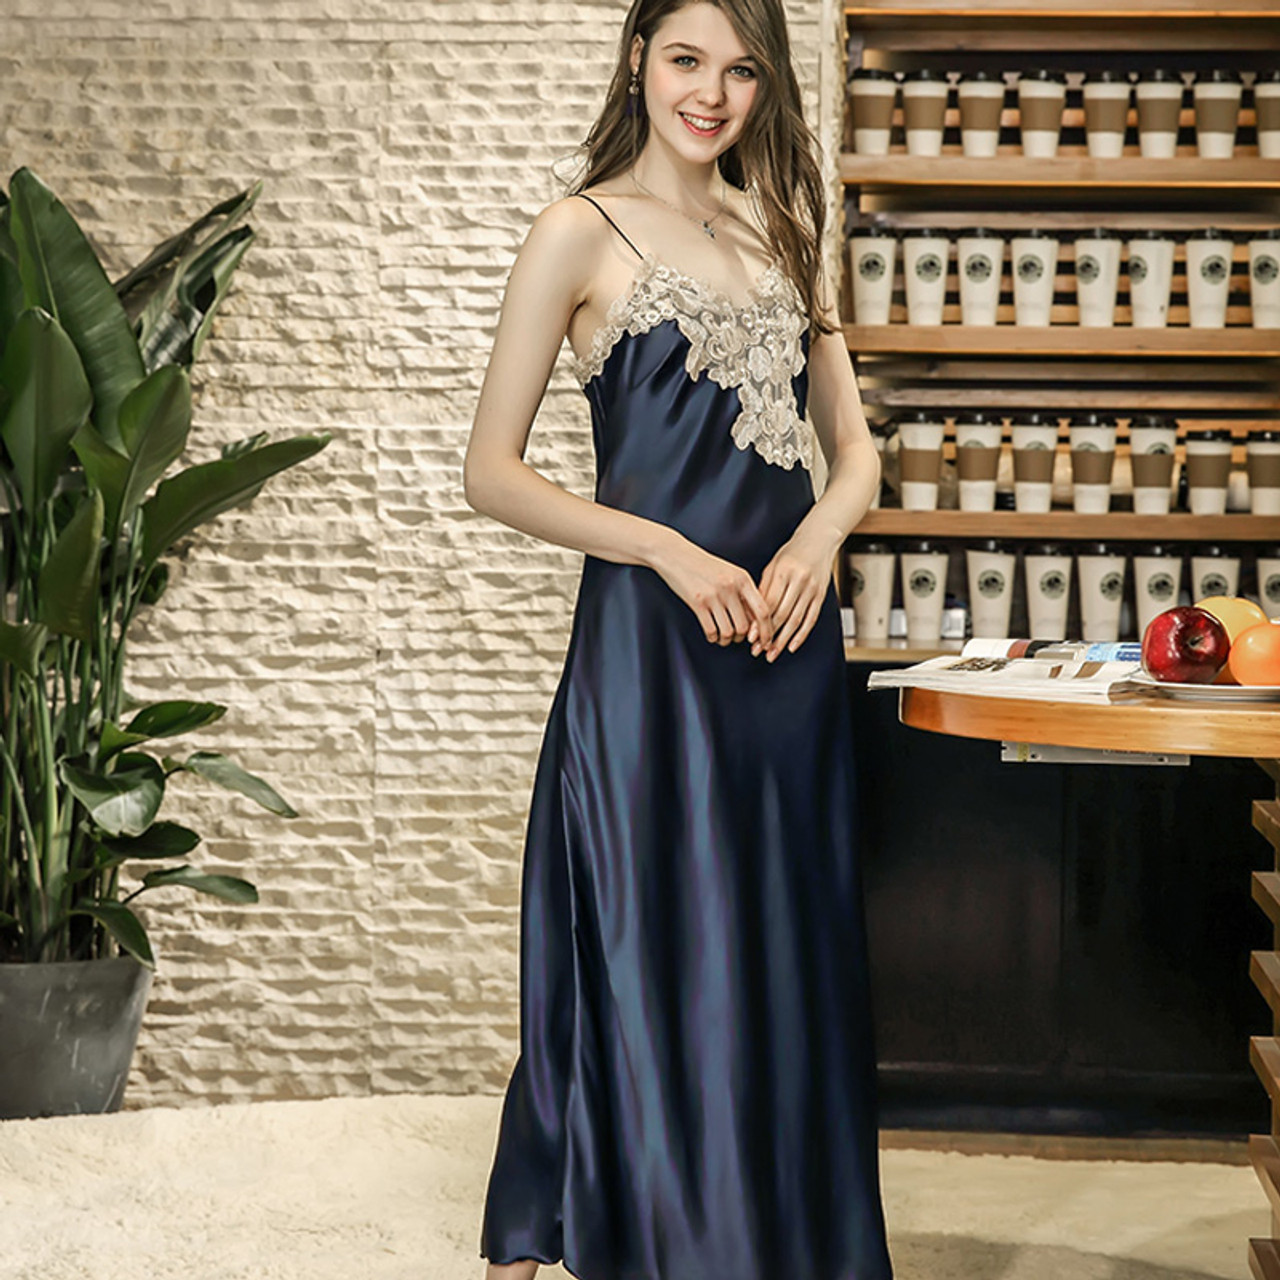 ad05201228be6 ... Ladies Sexy Silk Satin Nightgown Long Night Dress Lace Sleepshirt Summer  Nightdress V-neck Sleeping ...